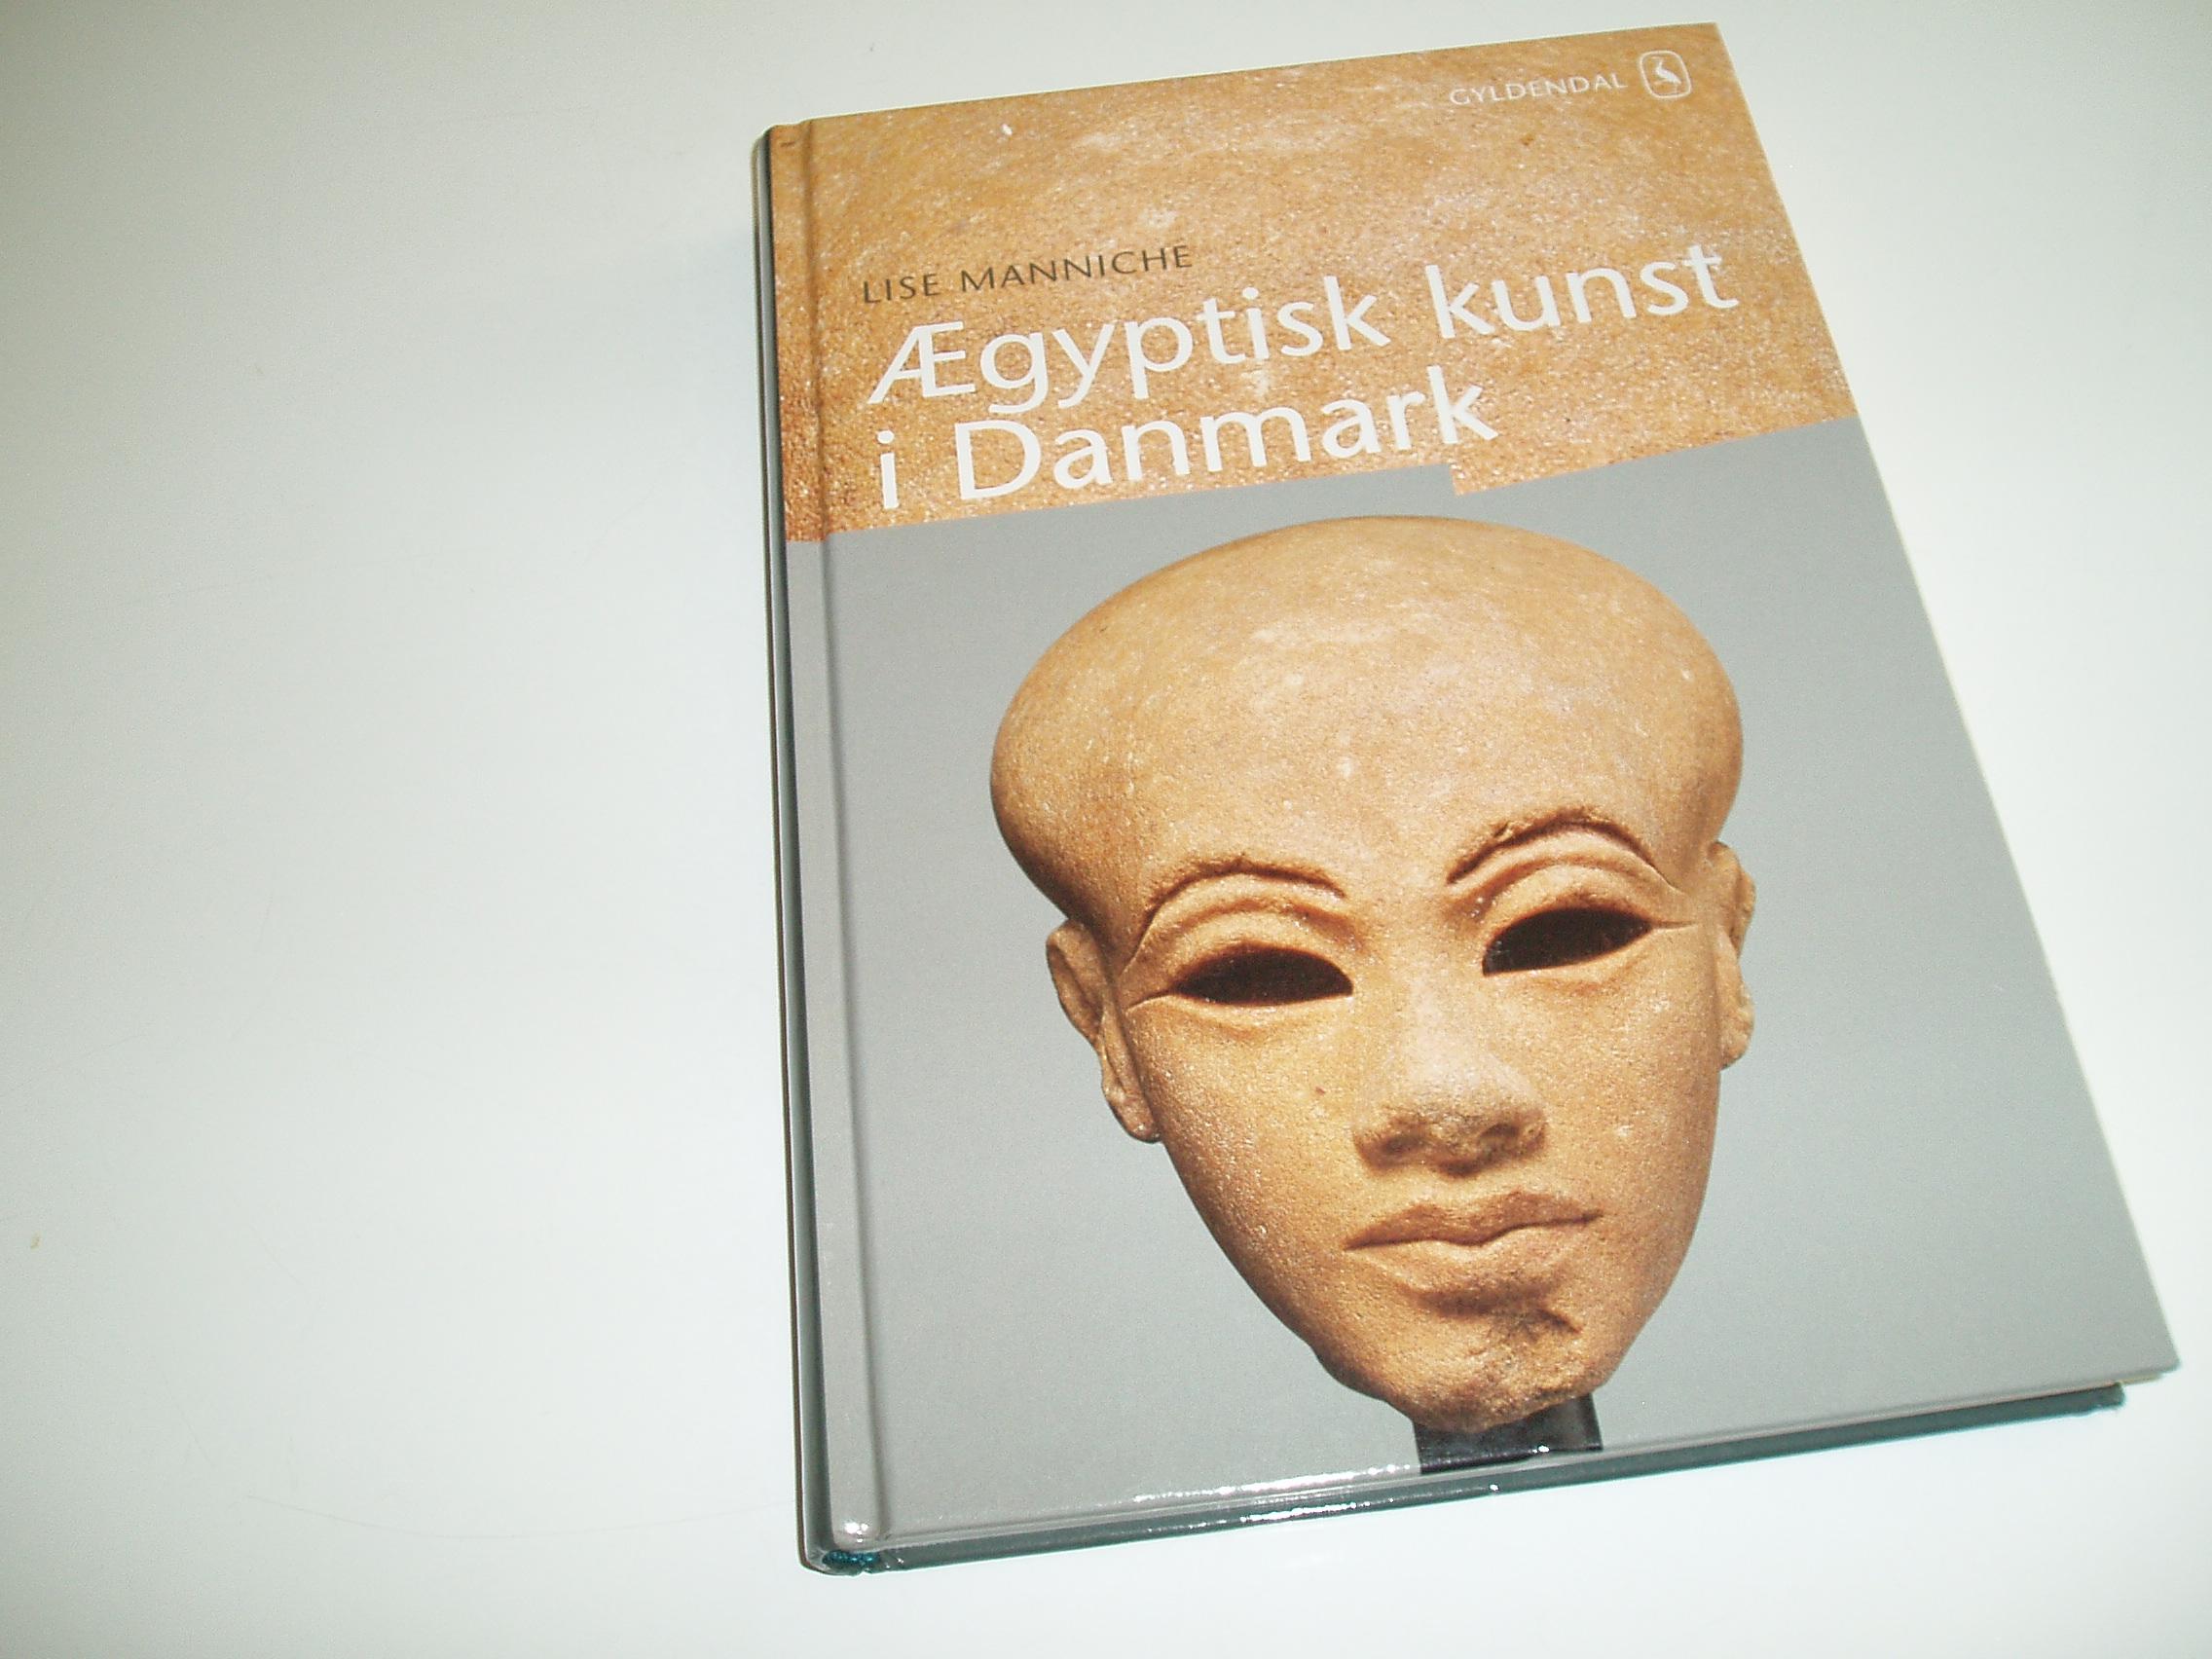 Ægyptisk kunst i Danmark